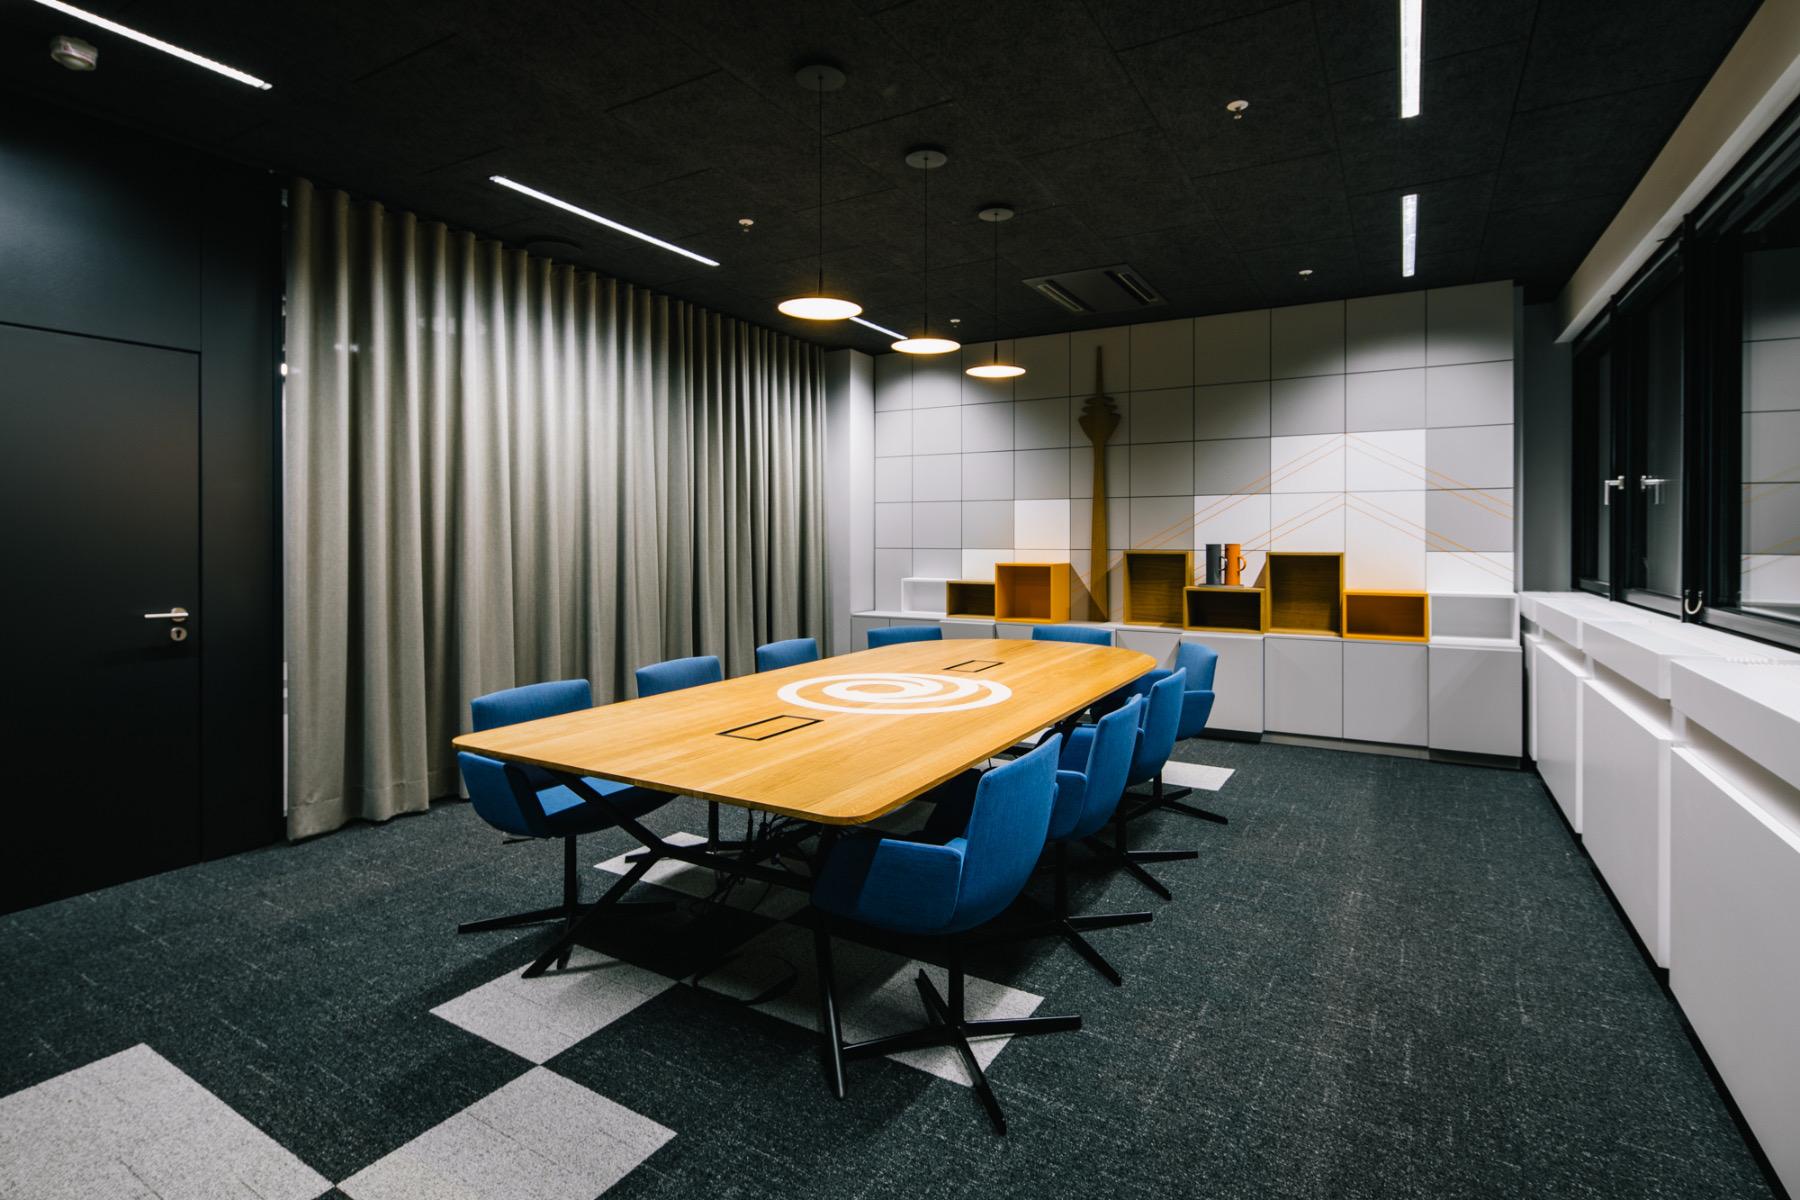 ubisoft-dusseldorf-office-9